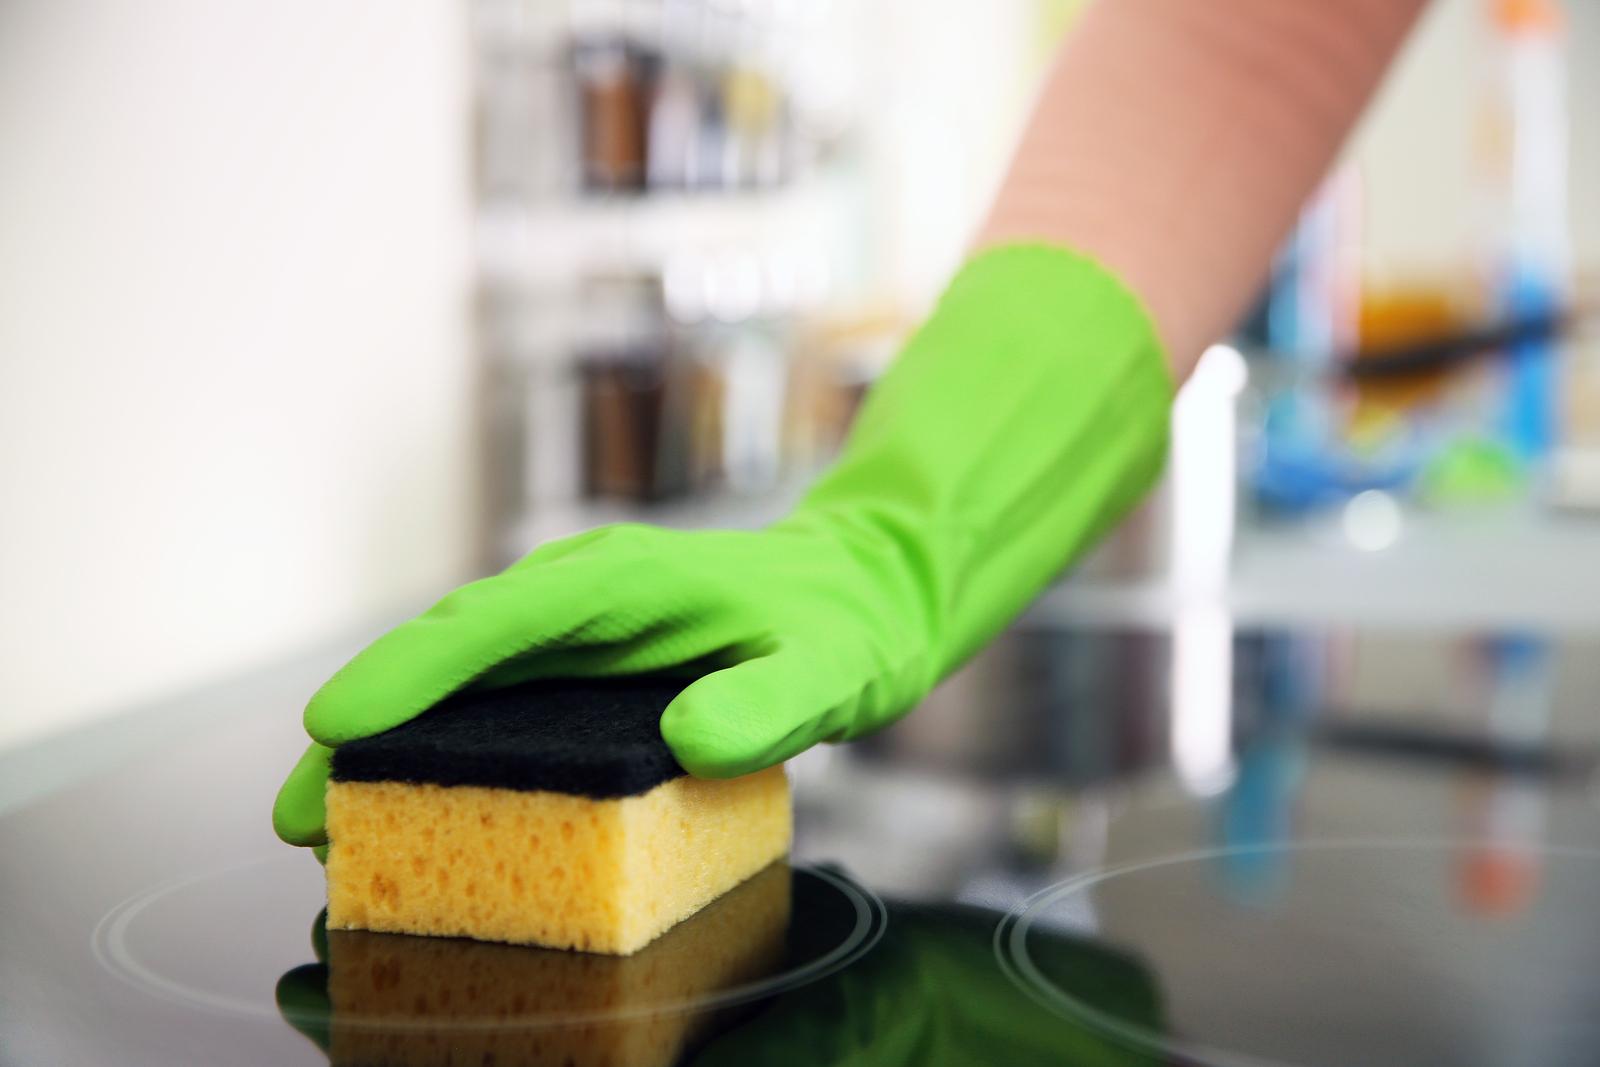 bigstock-Human-hand-in-protective-glove-126197132